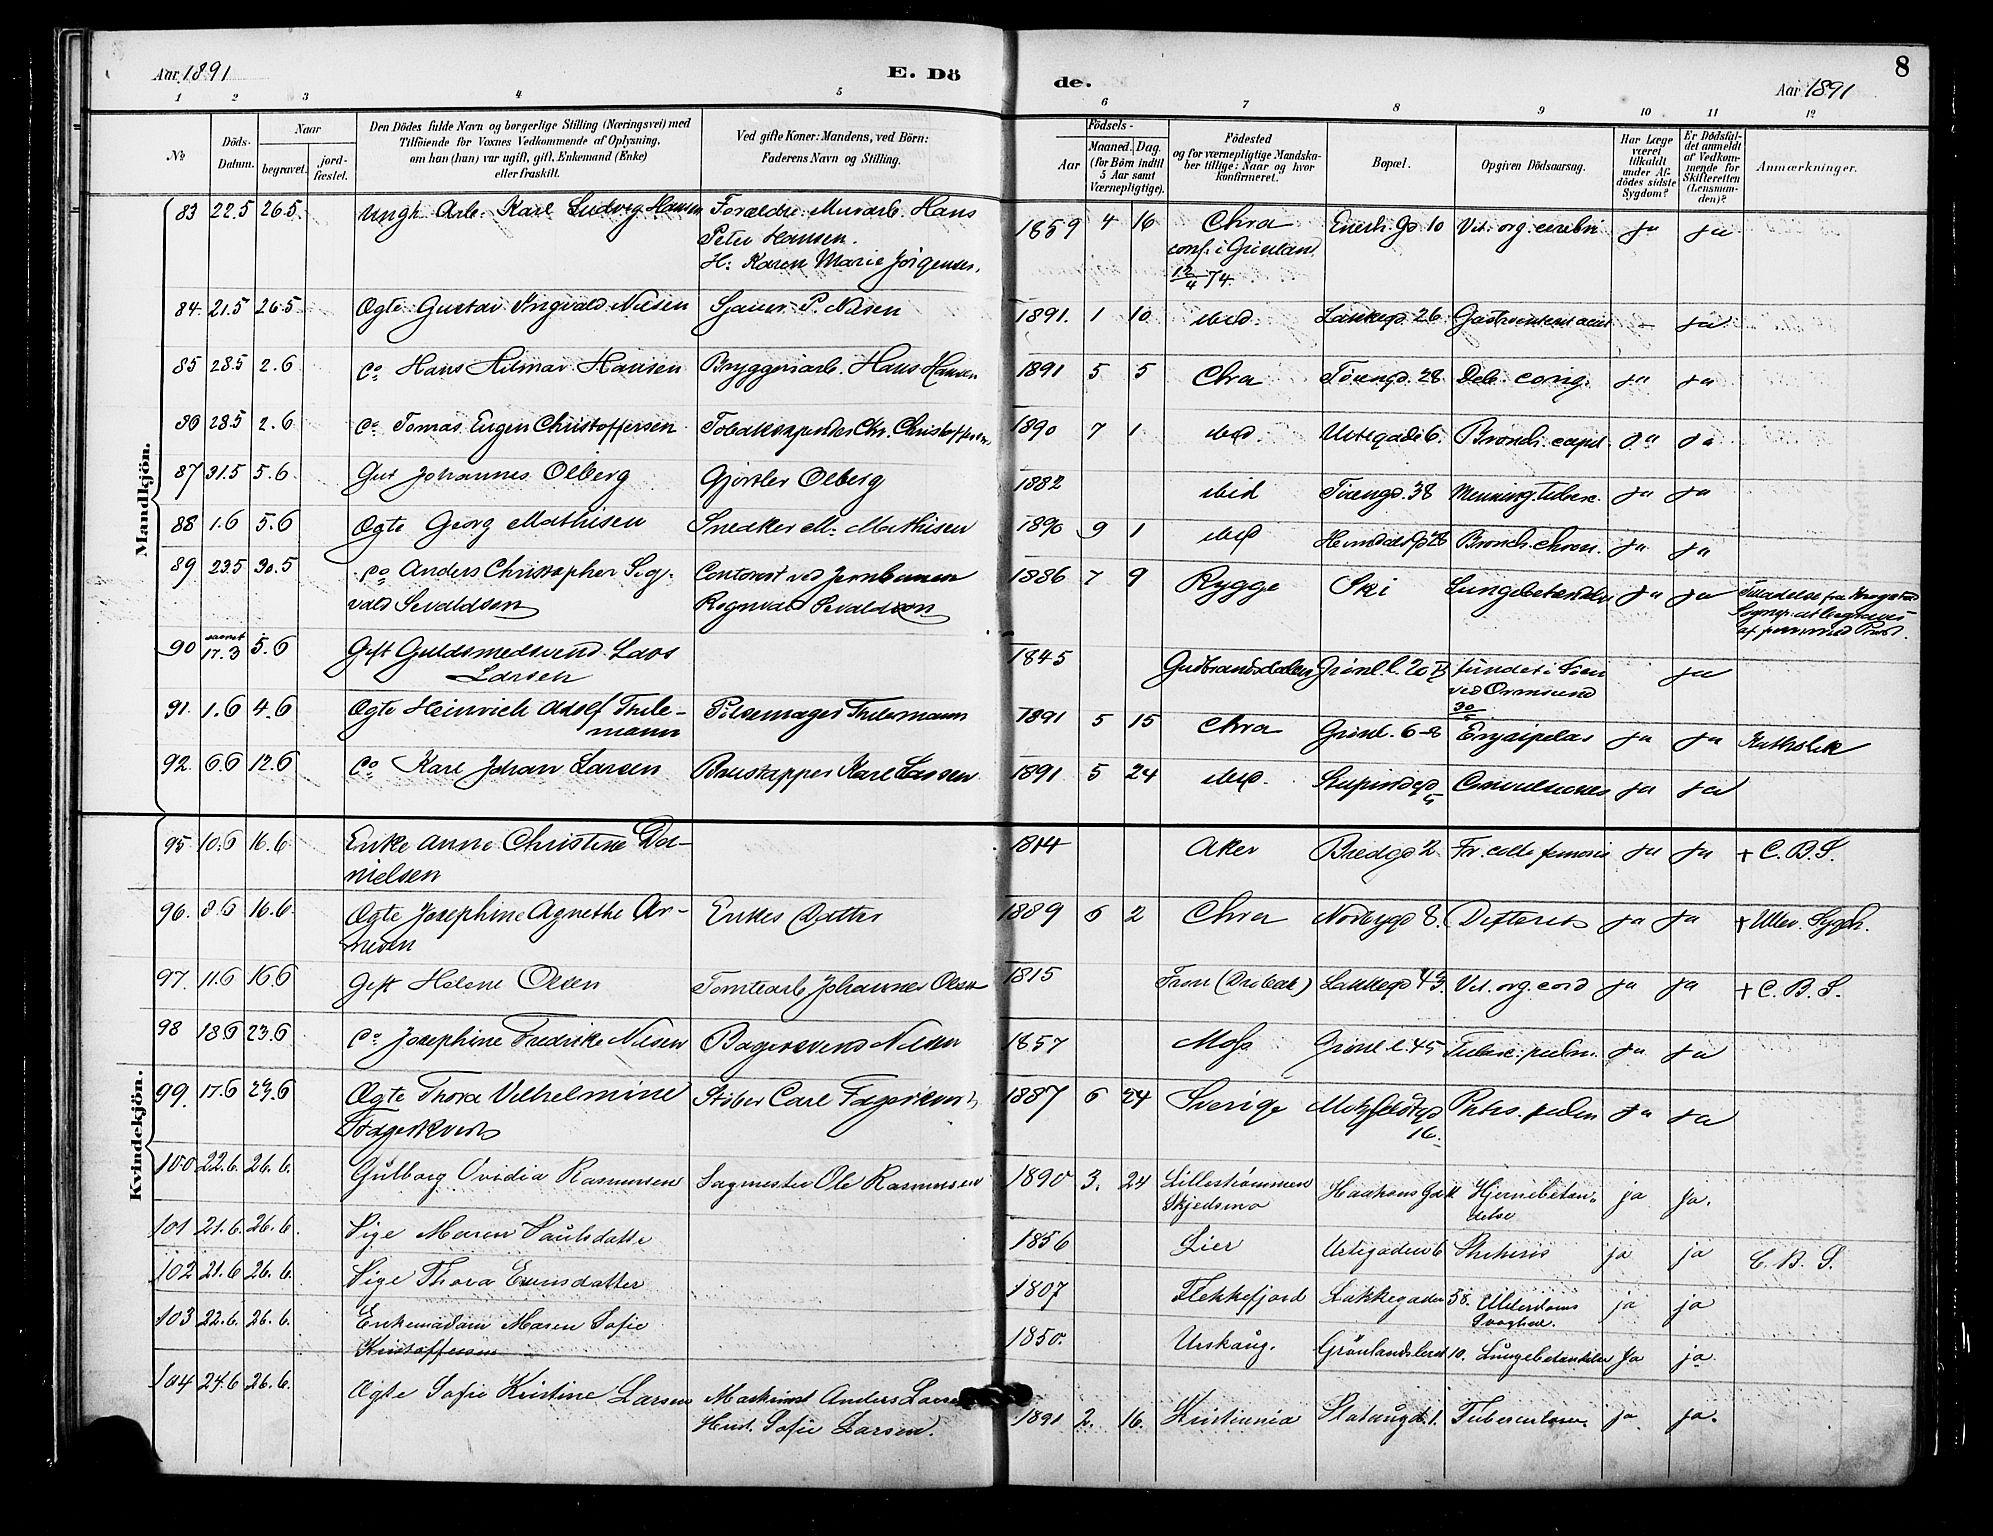 SAO, Grønland prestekontor Kirkebøker, F/Fa/L0010: Parish register (official) no. 10, 1891-1898, p. 8